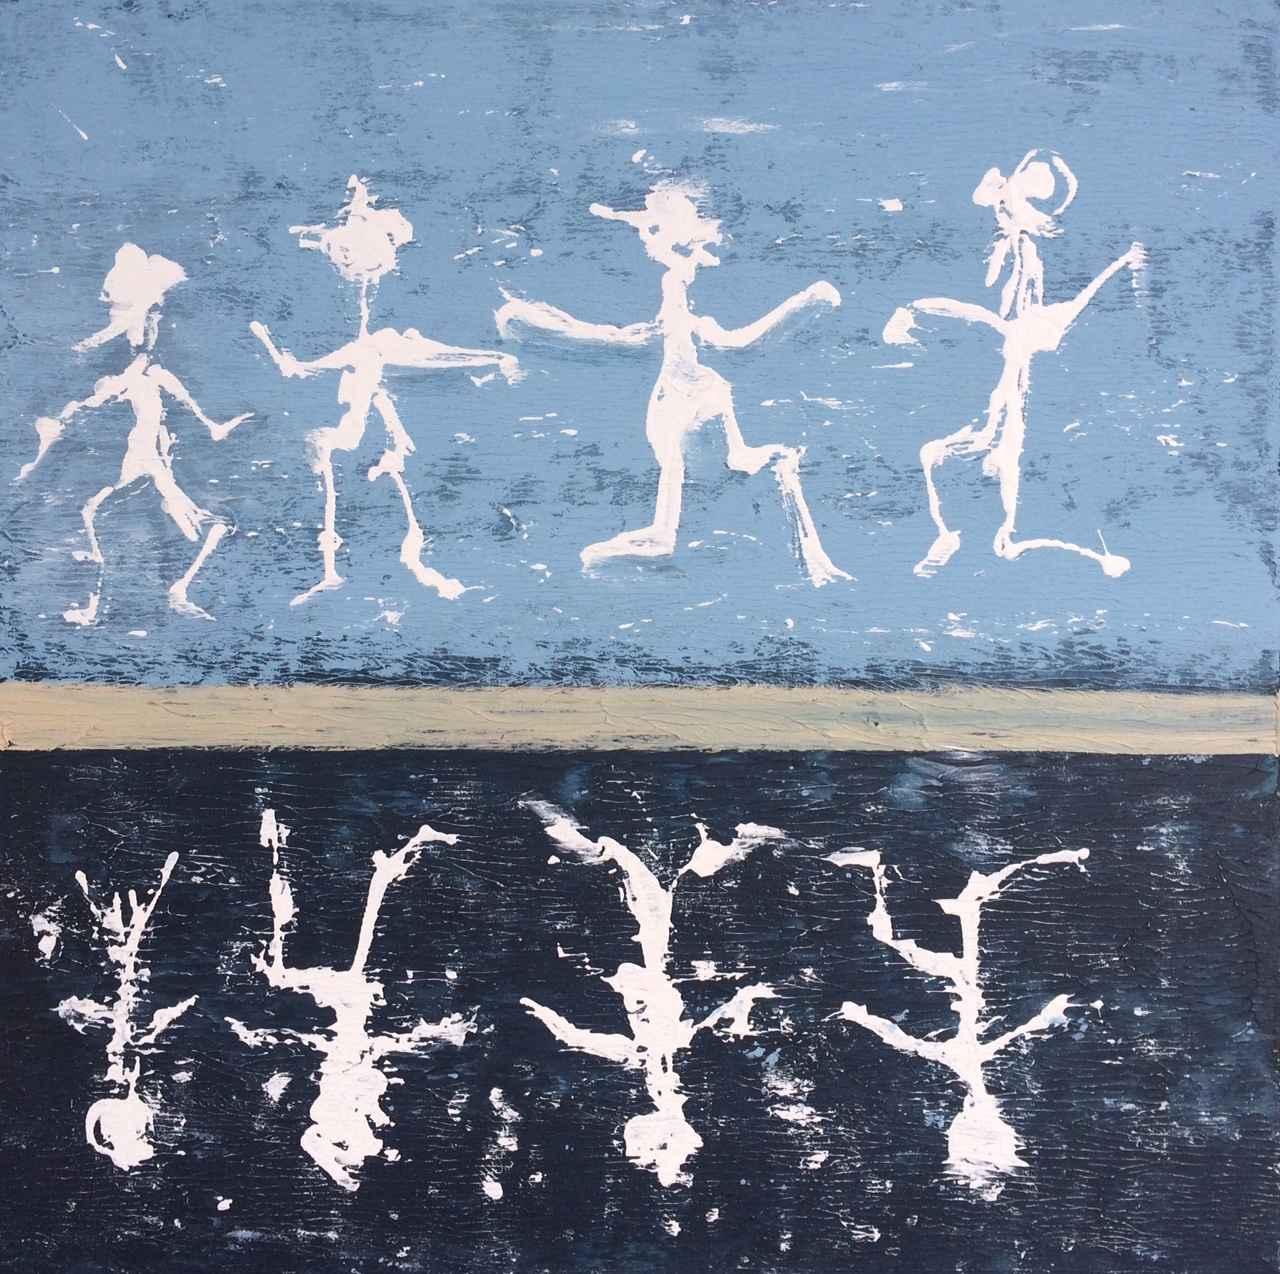 Dancing Clouds #8 by  Steve Lyons - Masterpiece Online